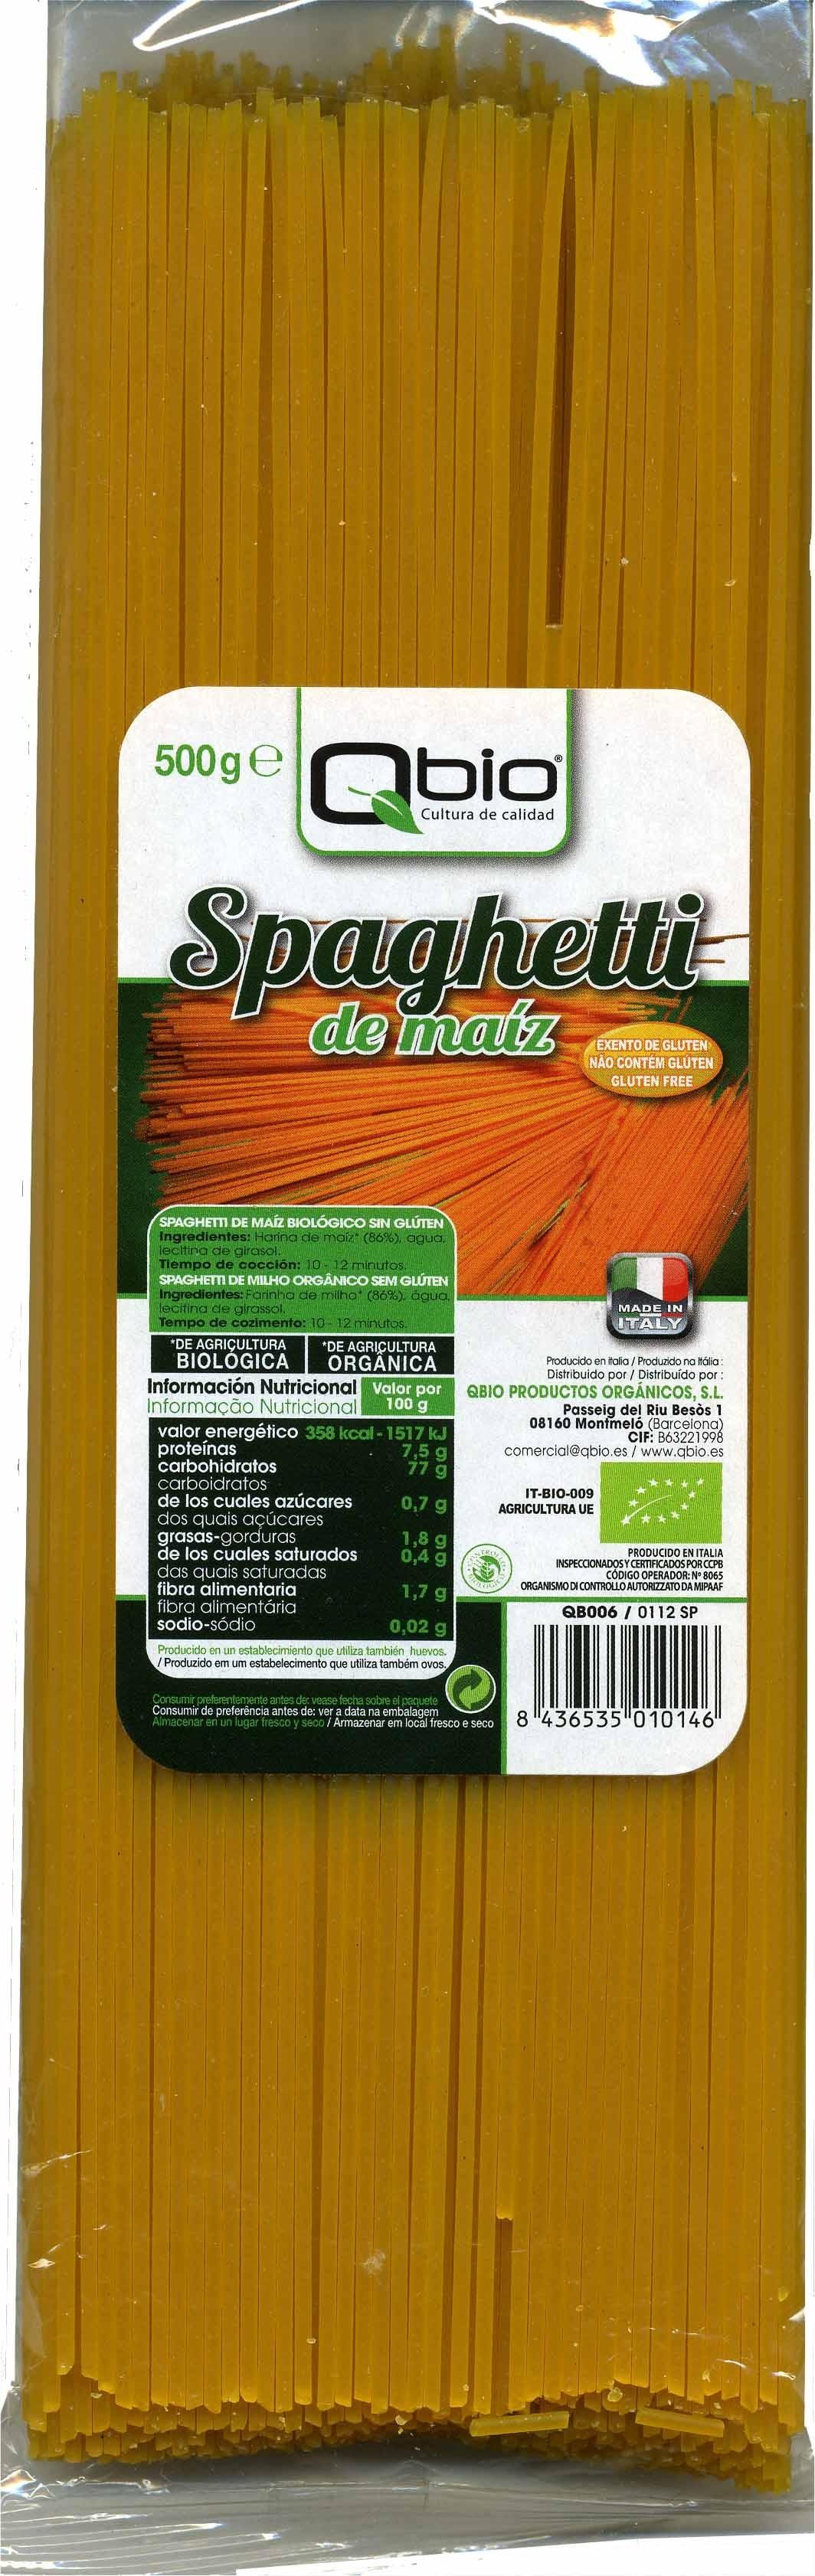 Spaghetti de maíz - Produit